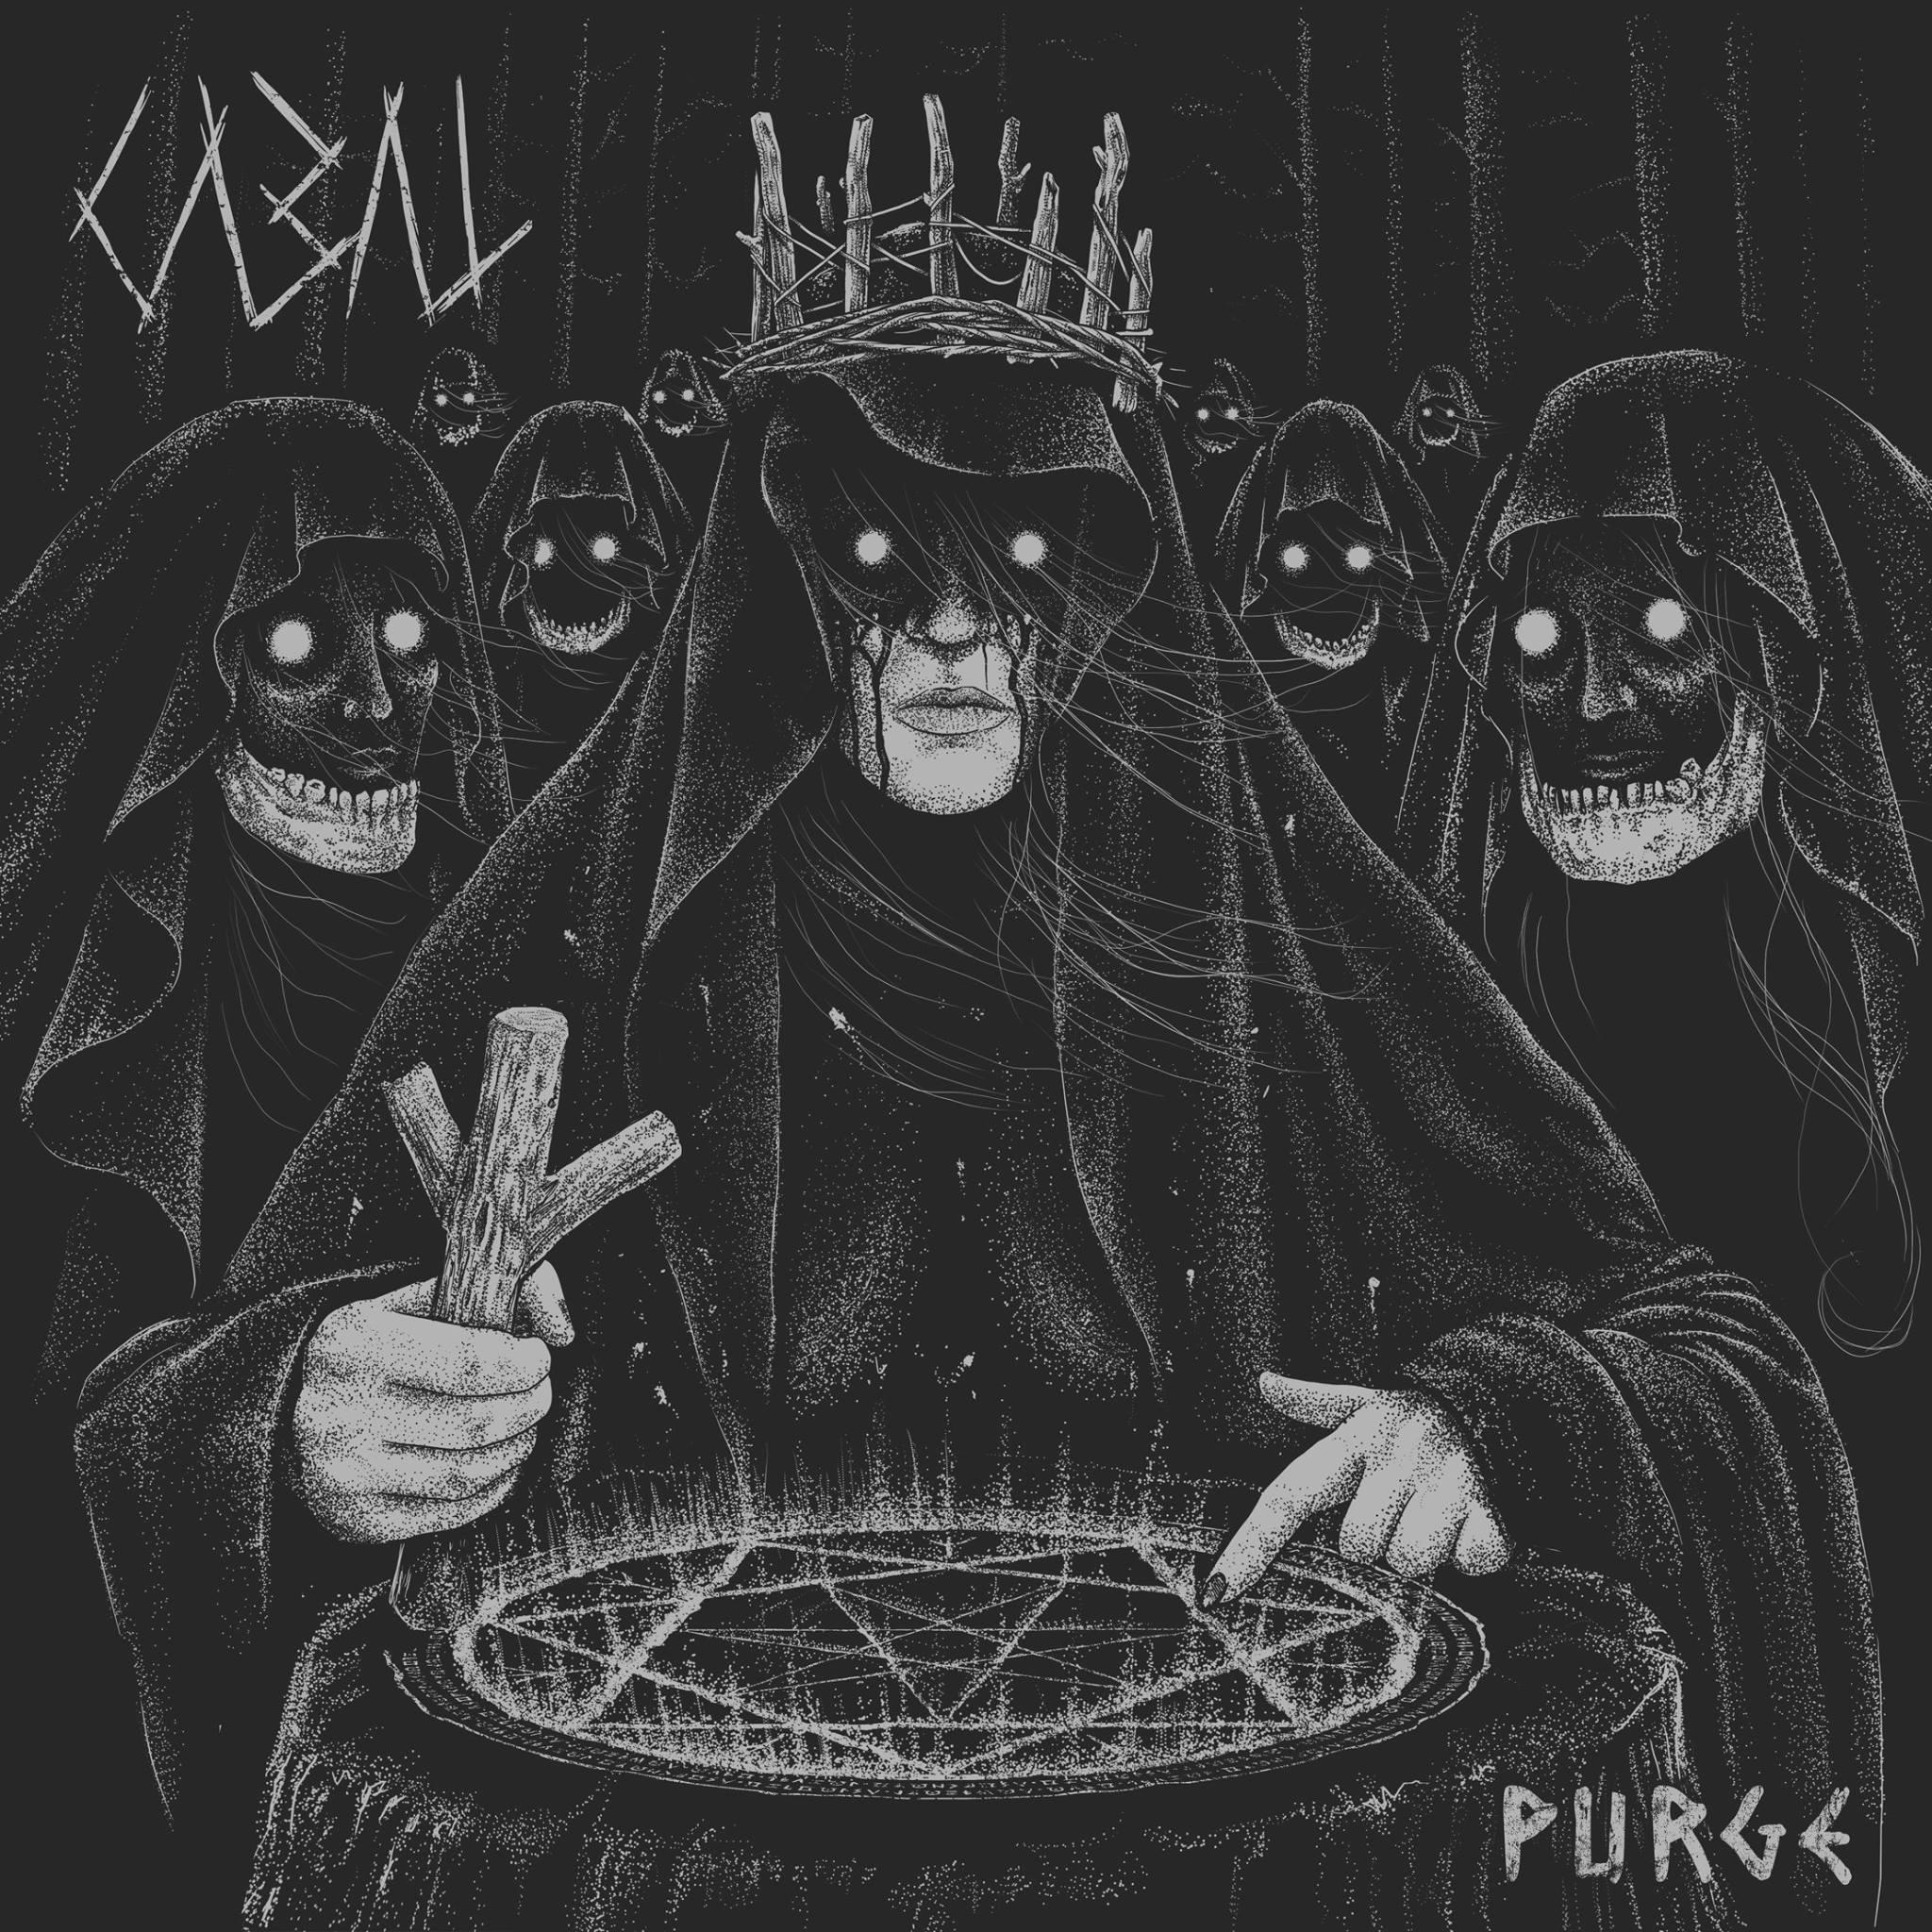 CABAL - Purge [EP] (2016)